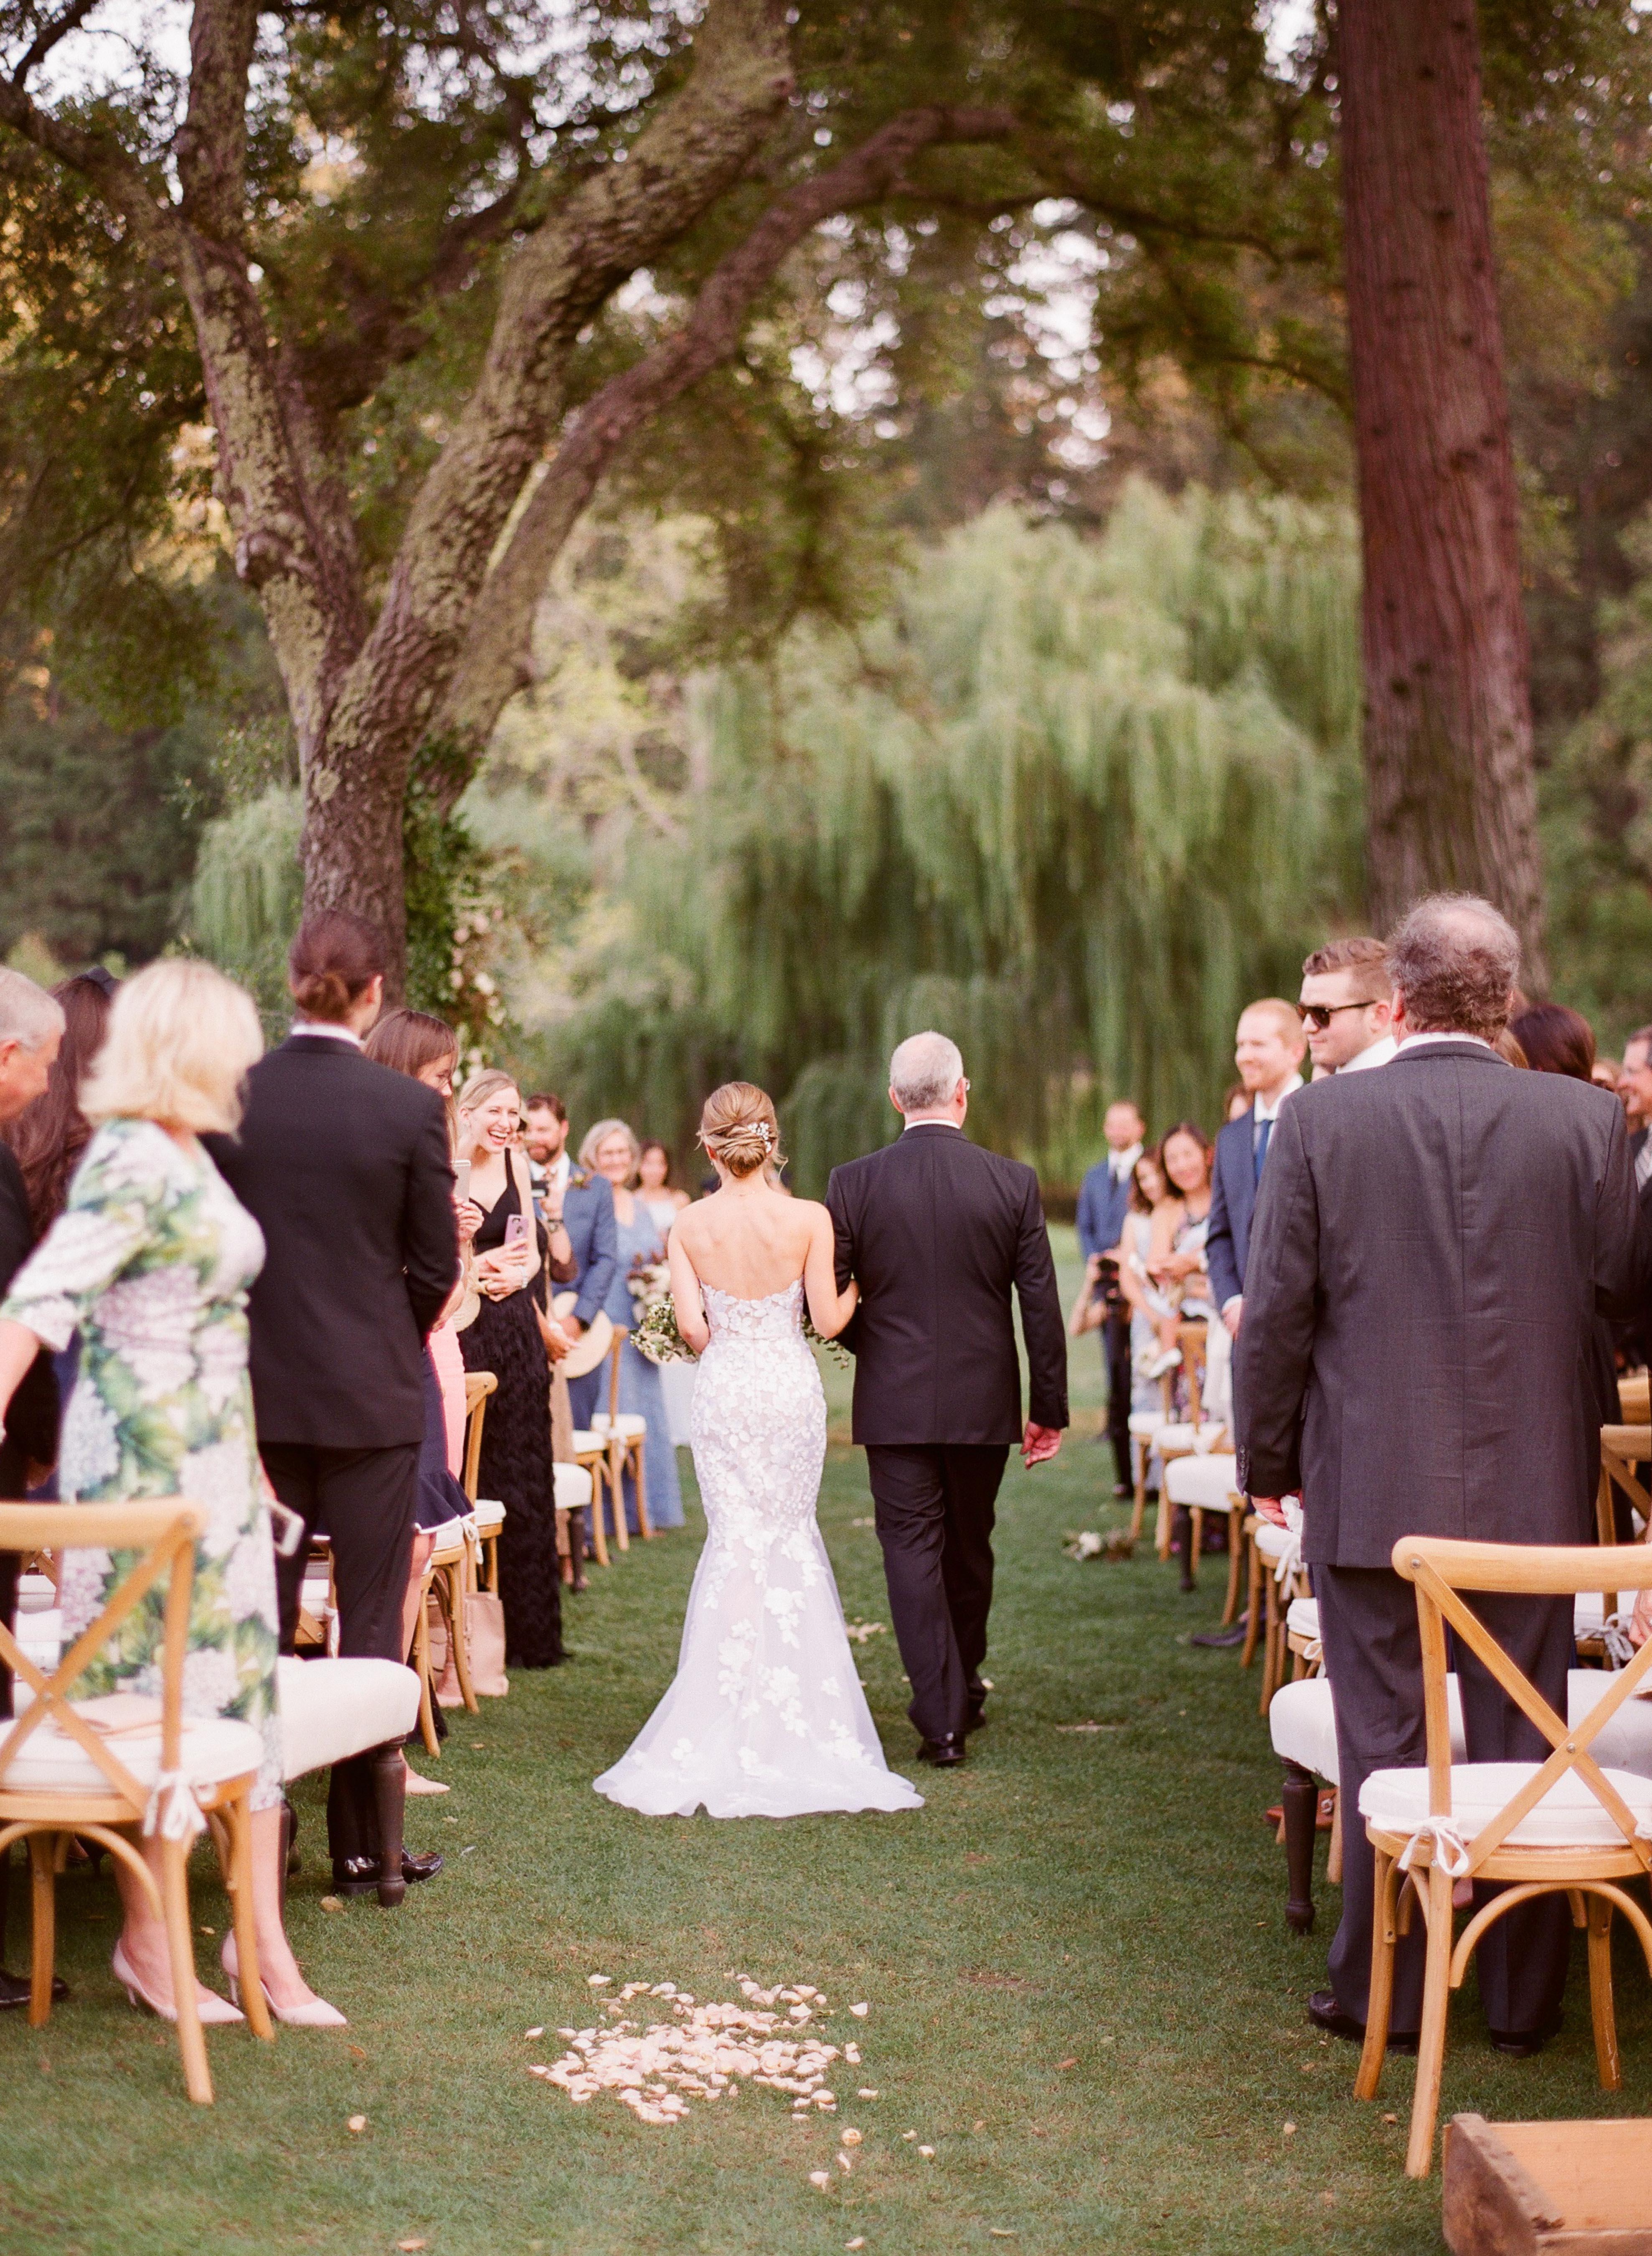 caitlin michael wedding processional